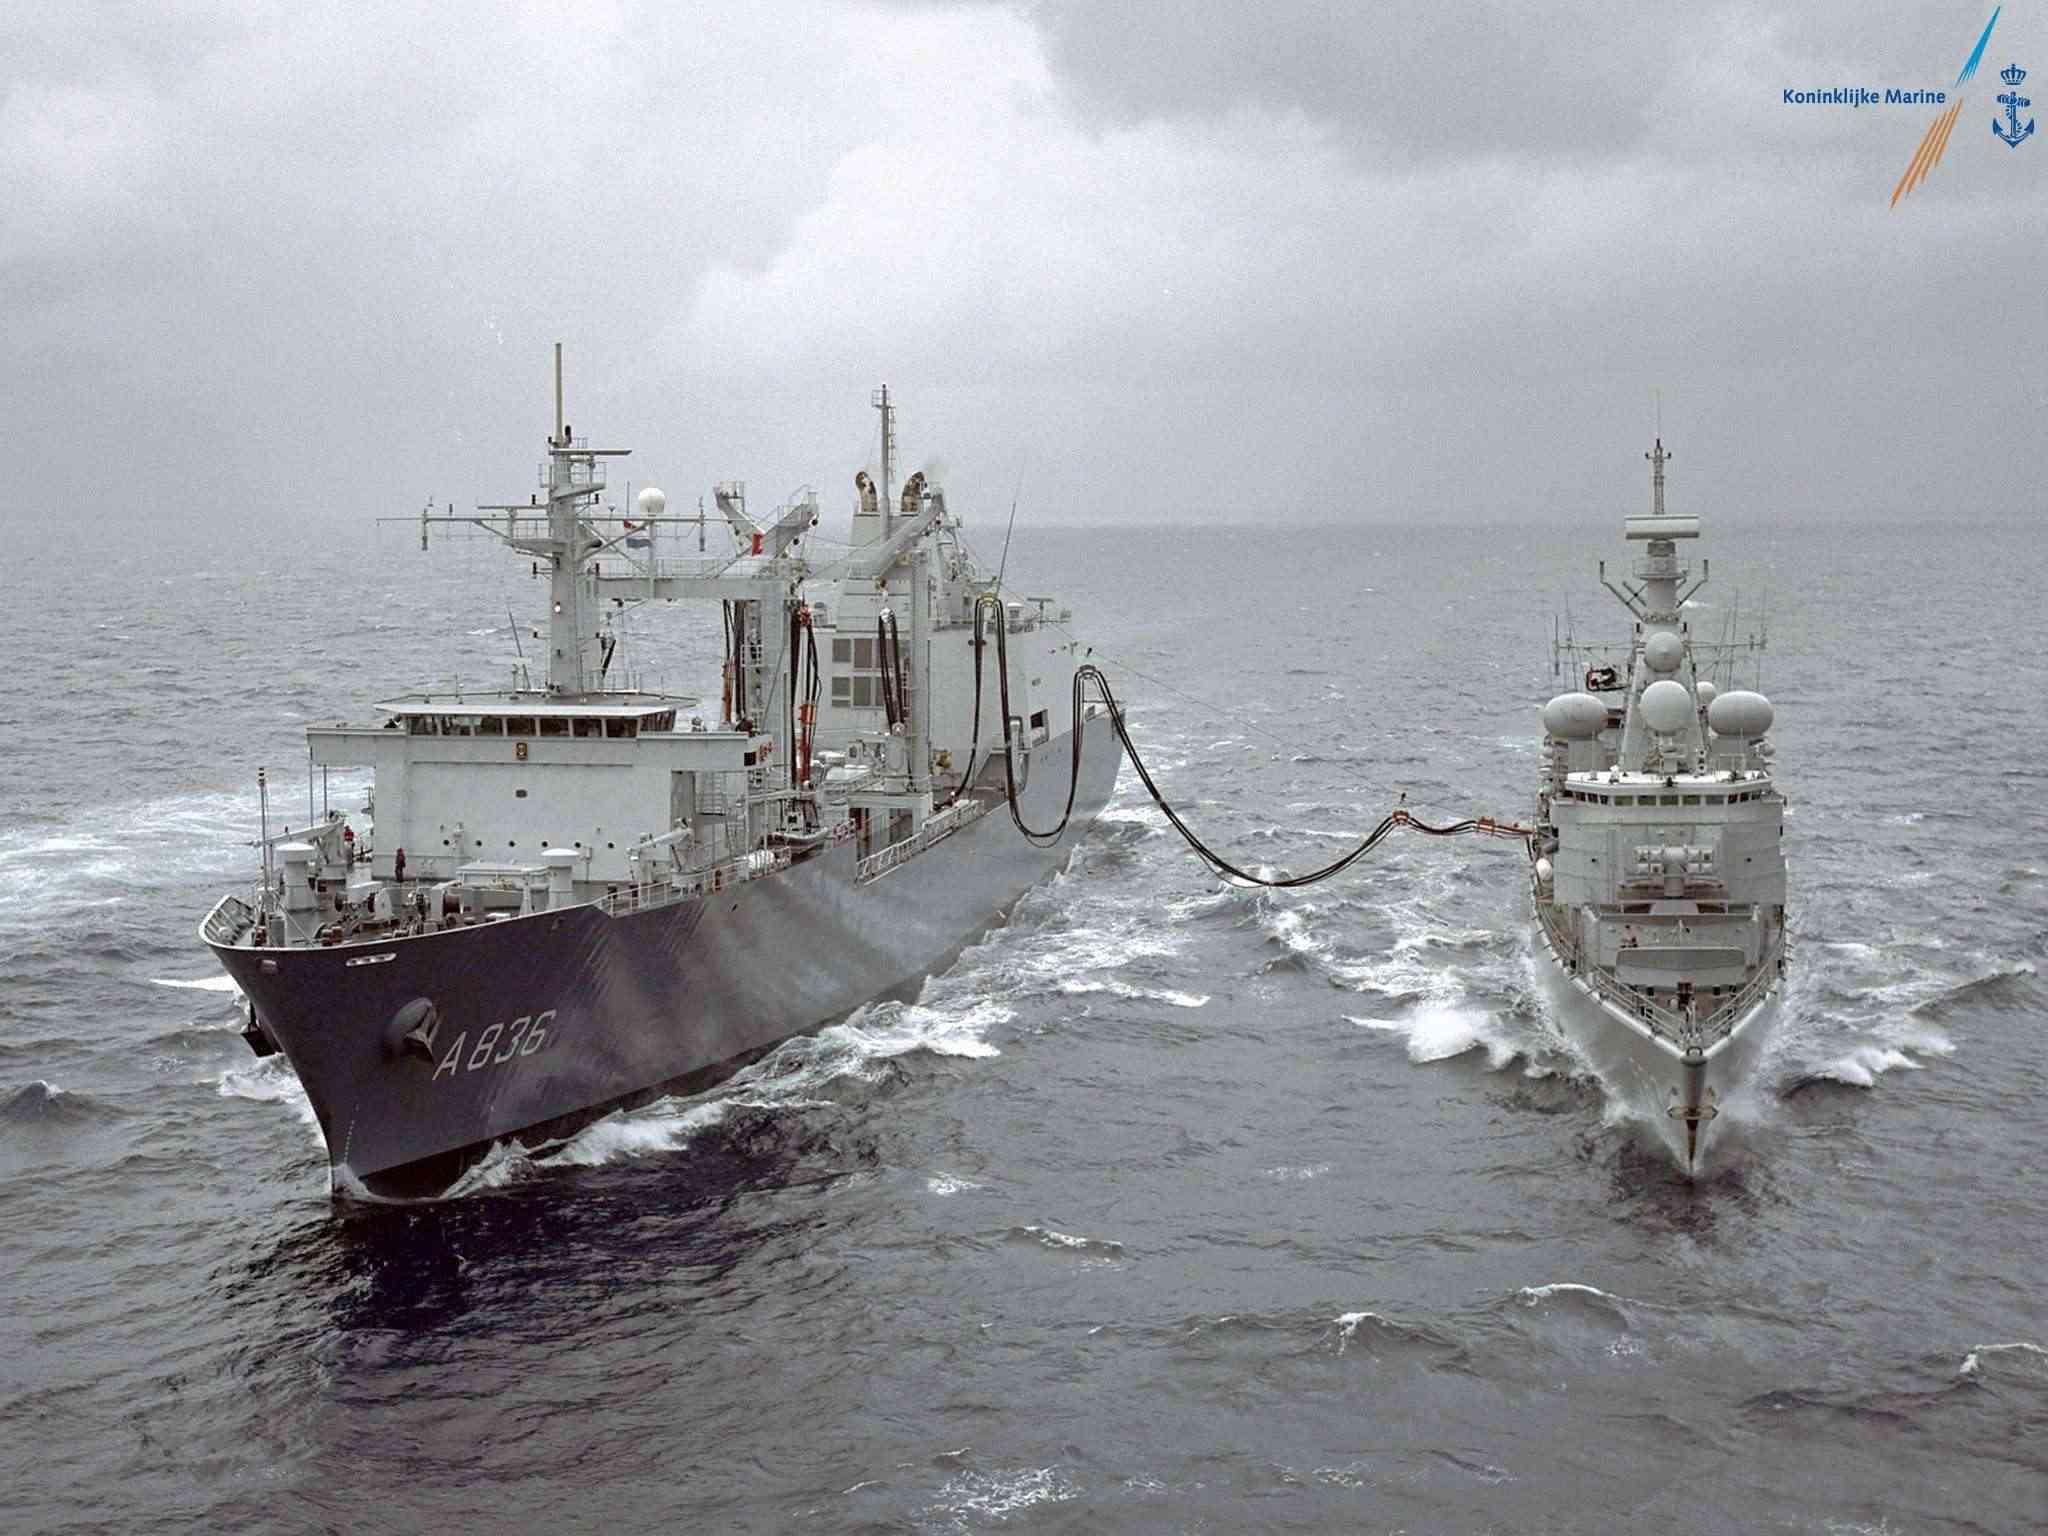 Bevoorradingsschip - Replenishment ships - Ravitailleurs Adam2010